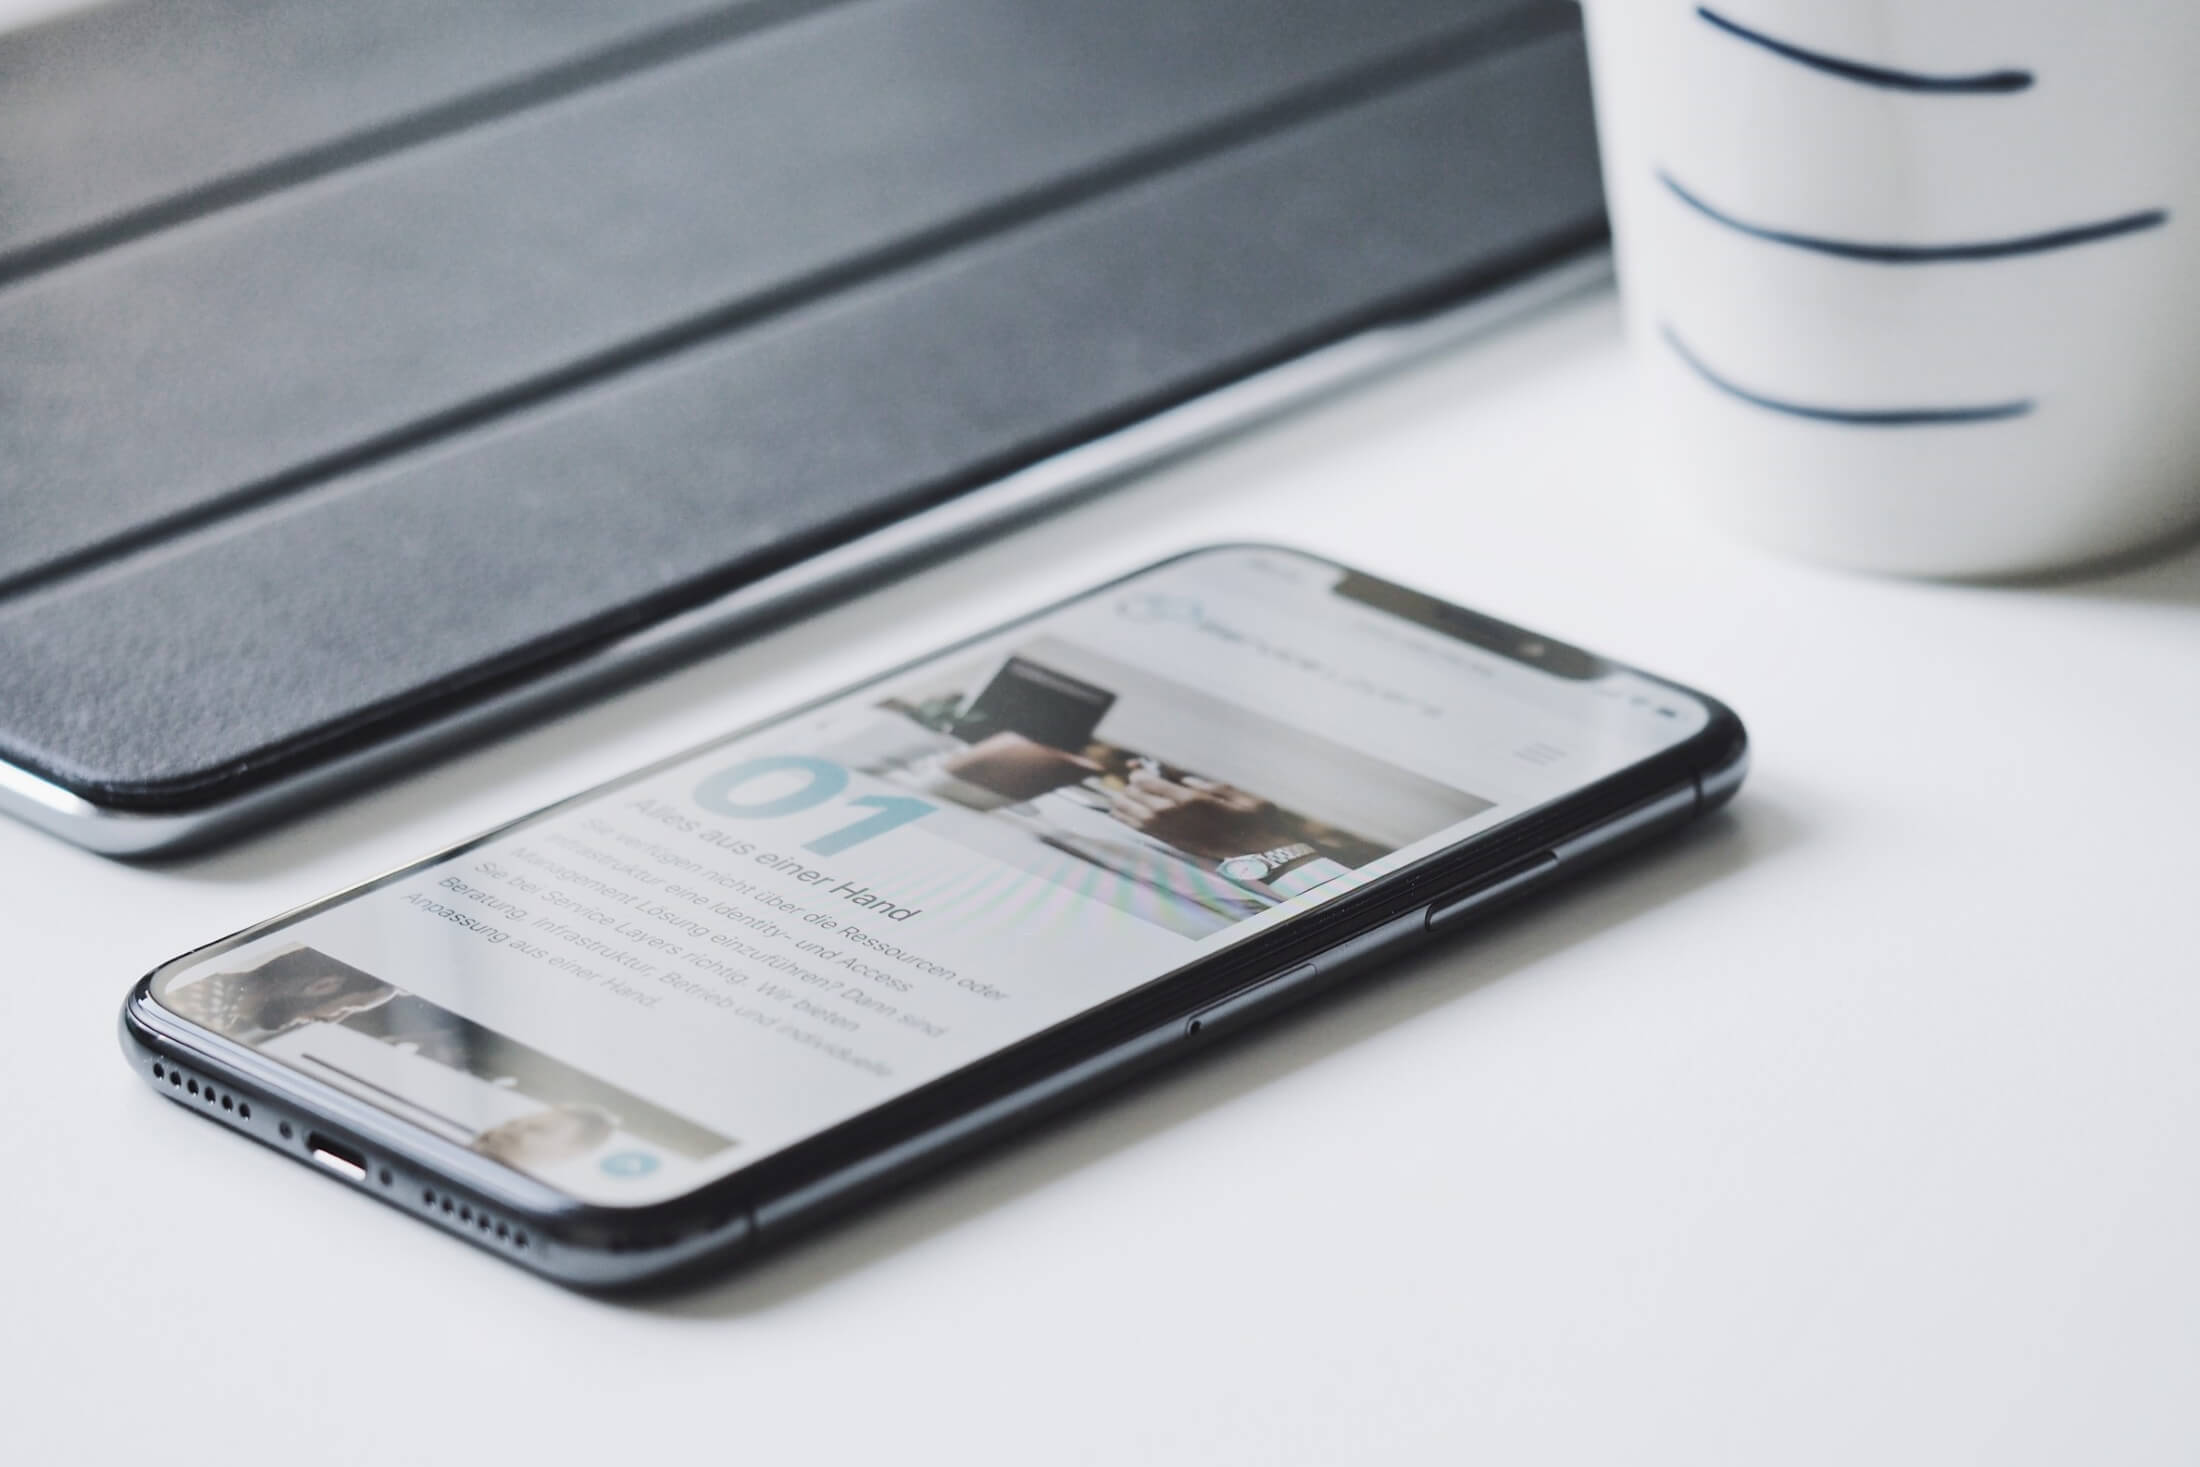 параметры смартфона: экран и корпус